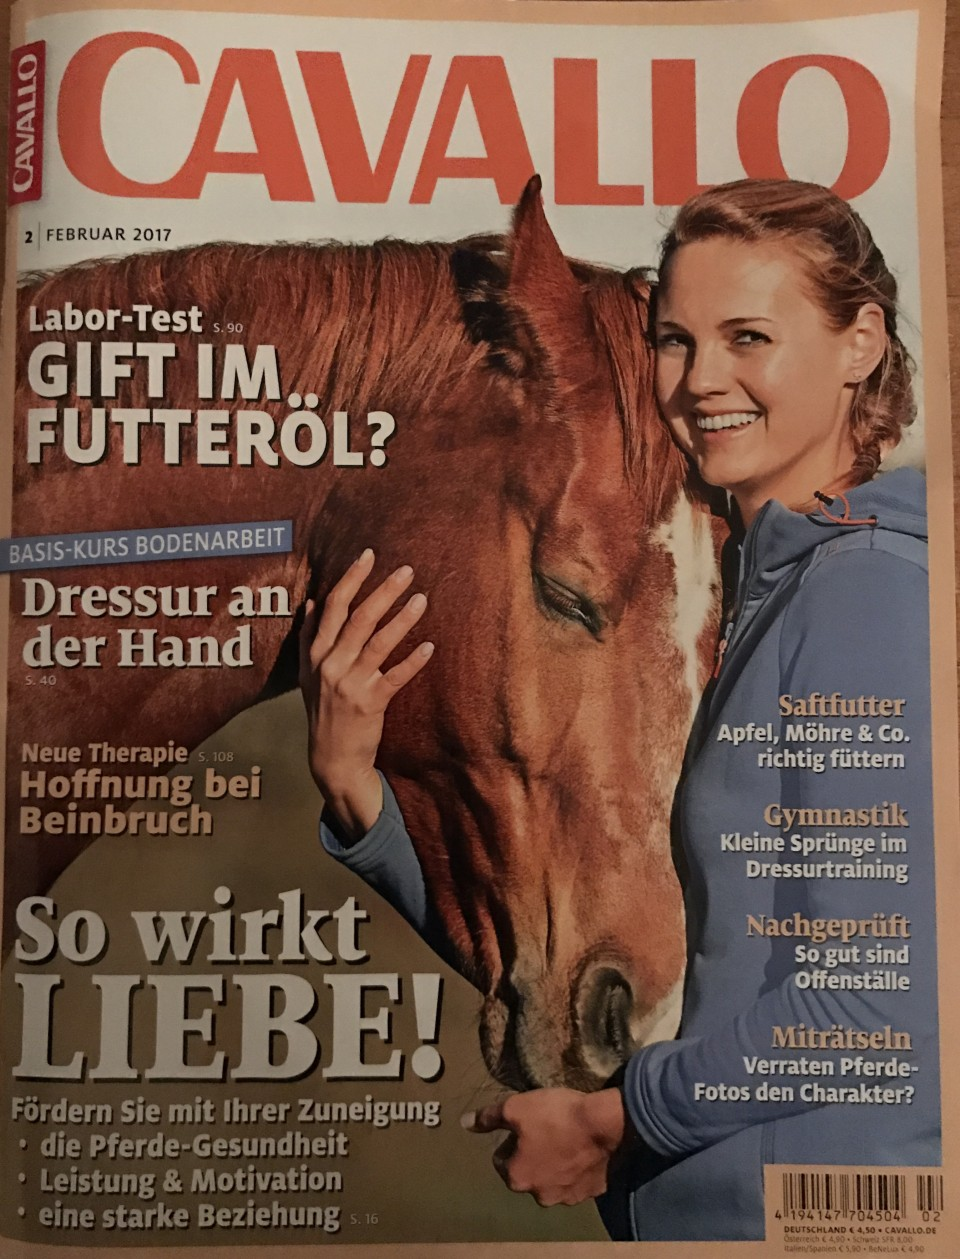 Cavallo Interview